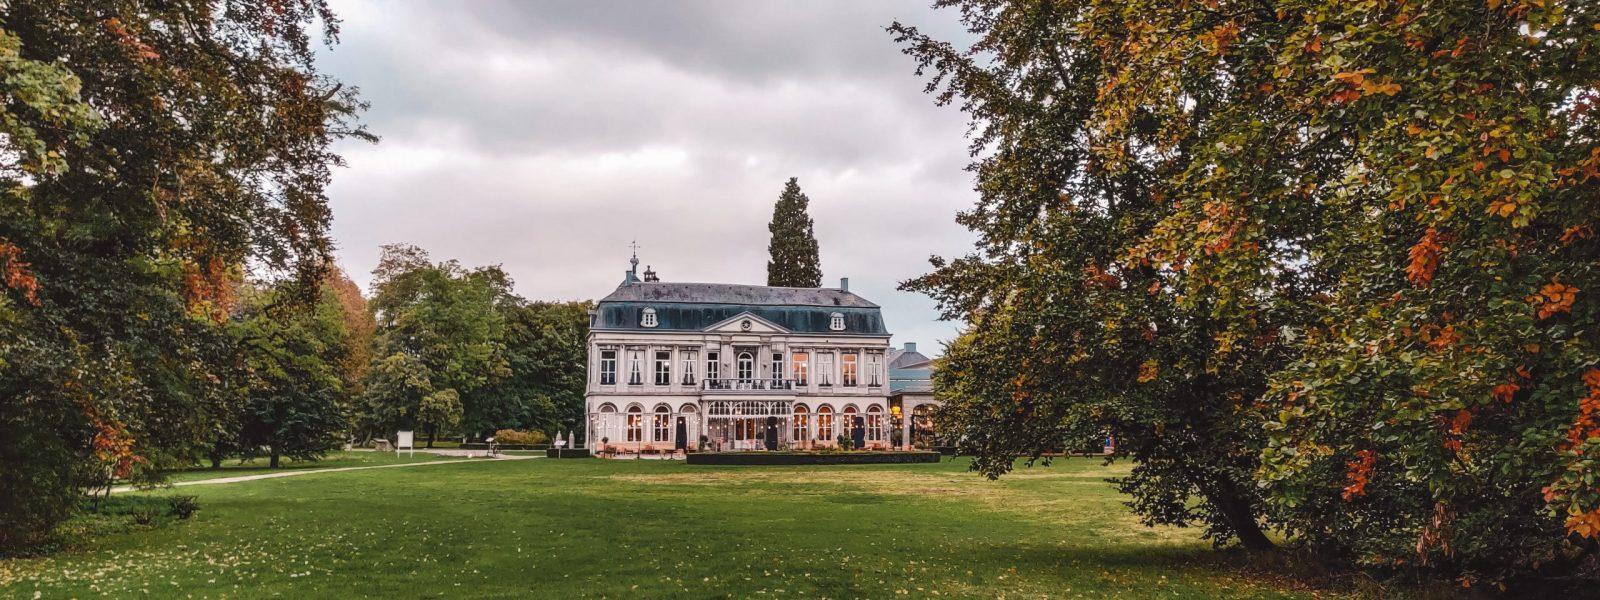 Vaeshartelt: magical nights at a castle near Maastricht